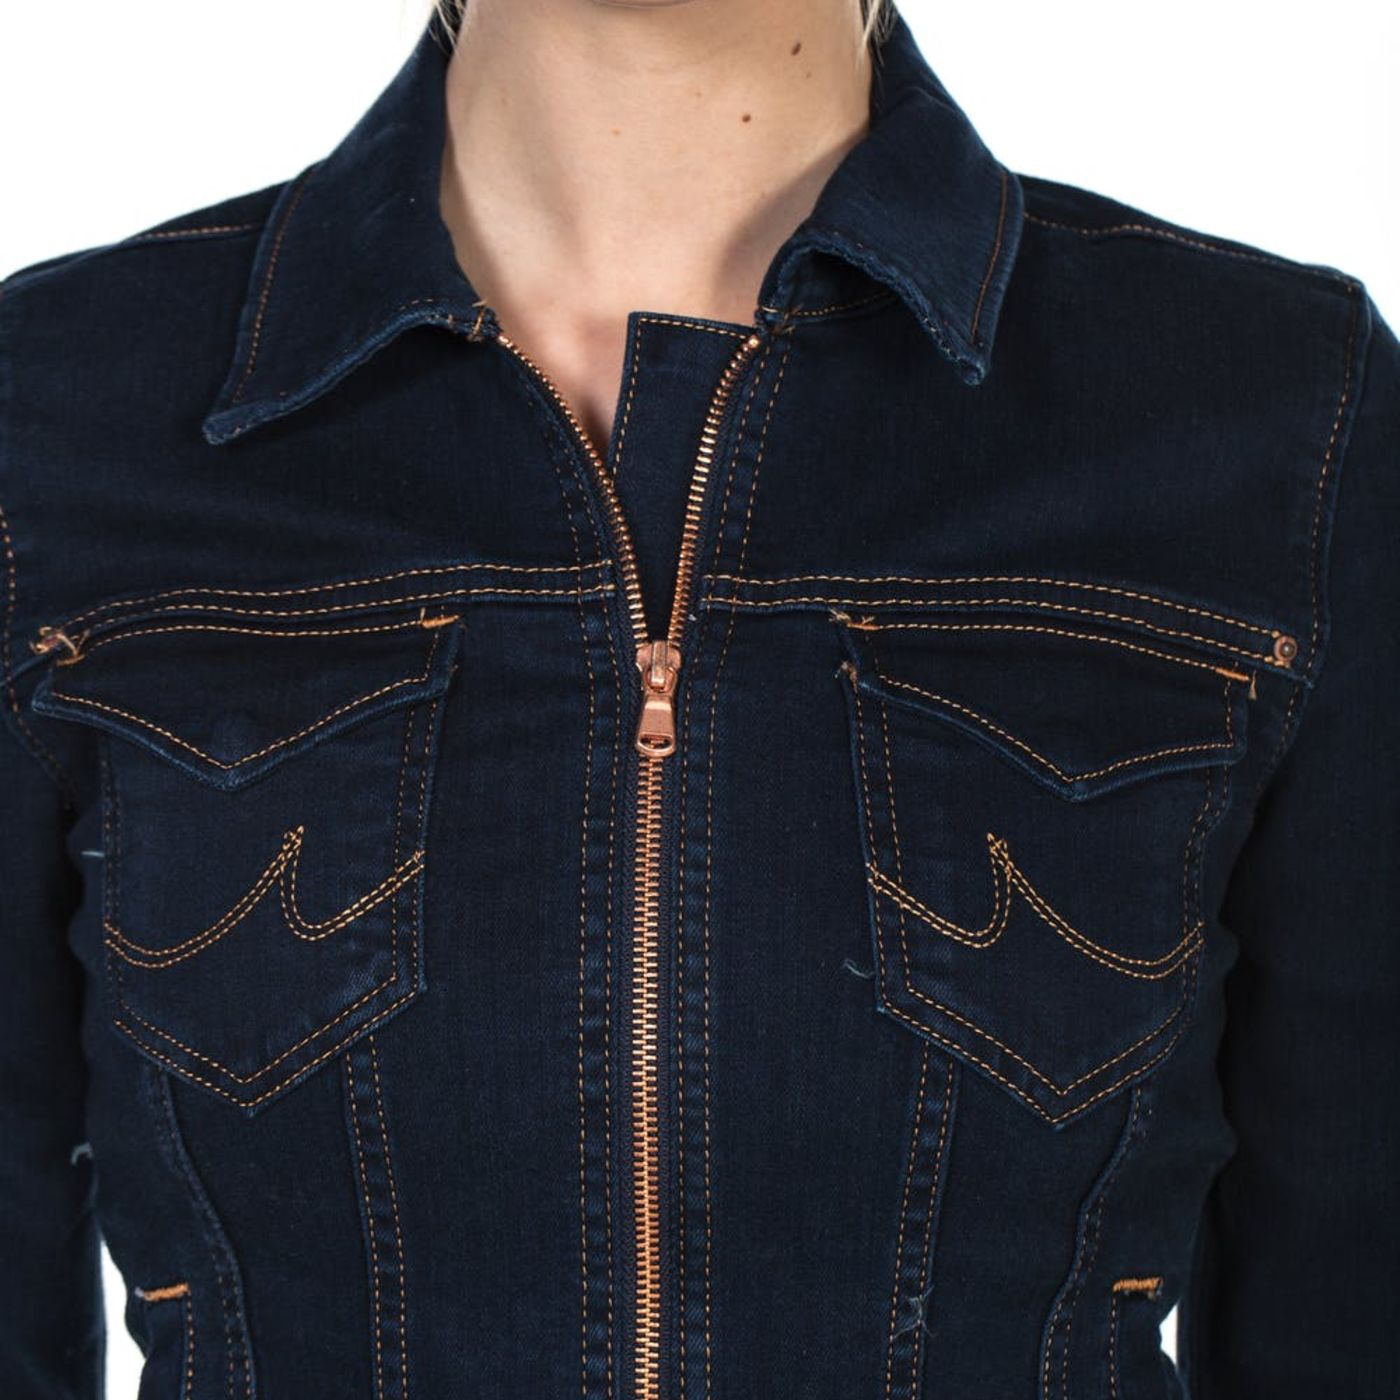 Zipping Up a Jacket